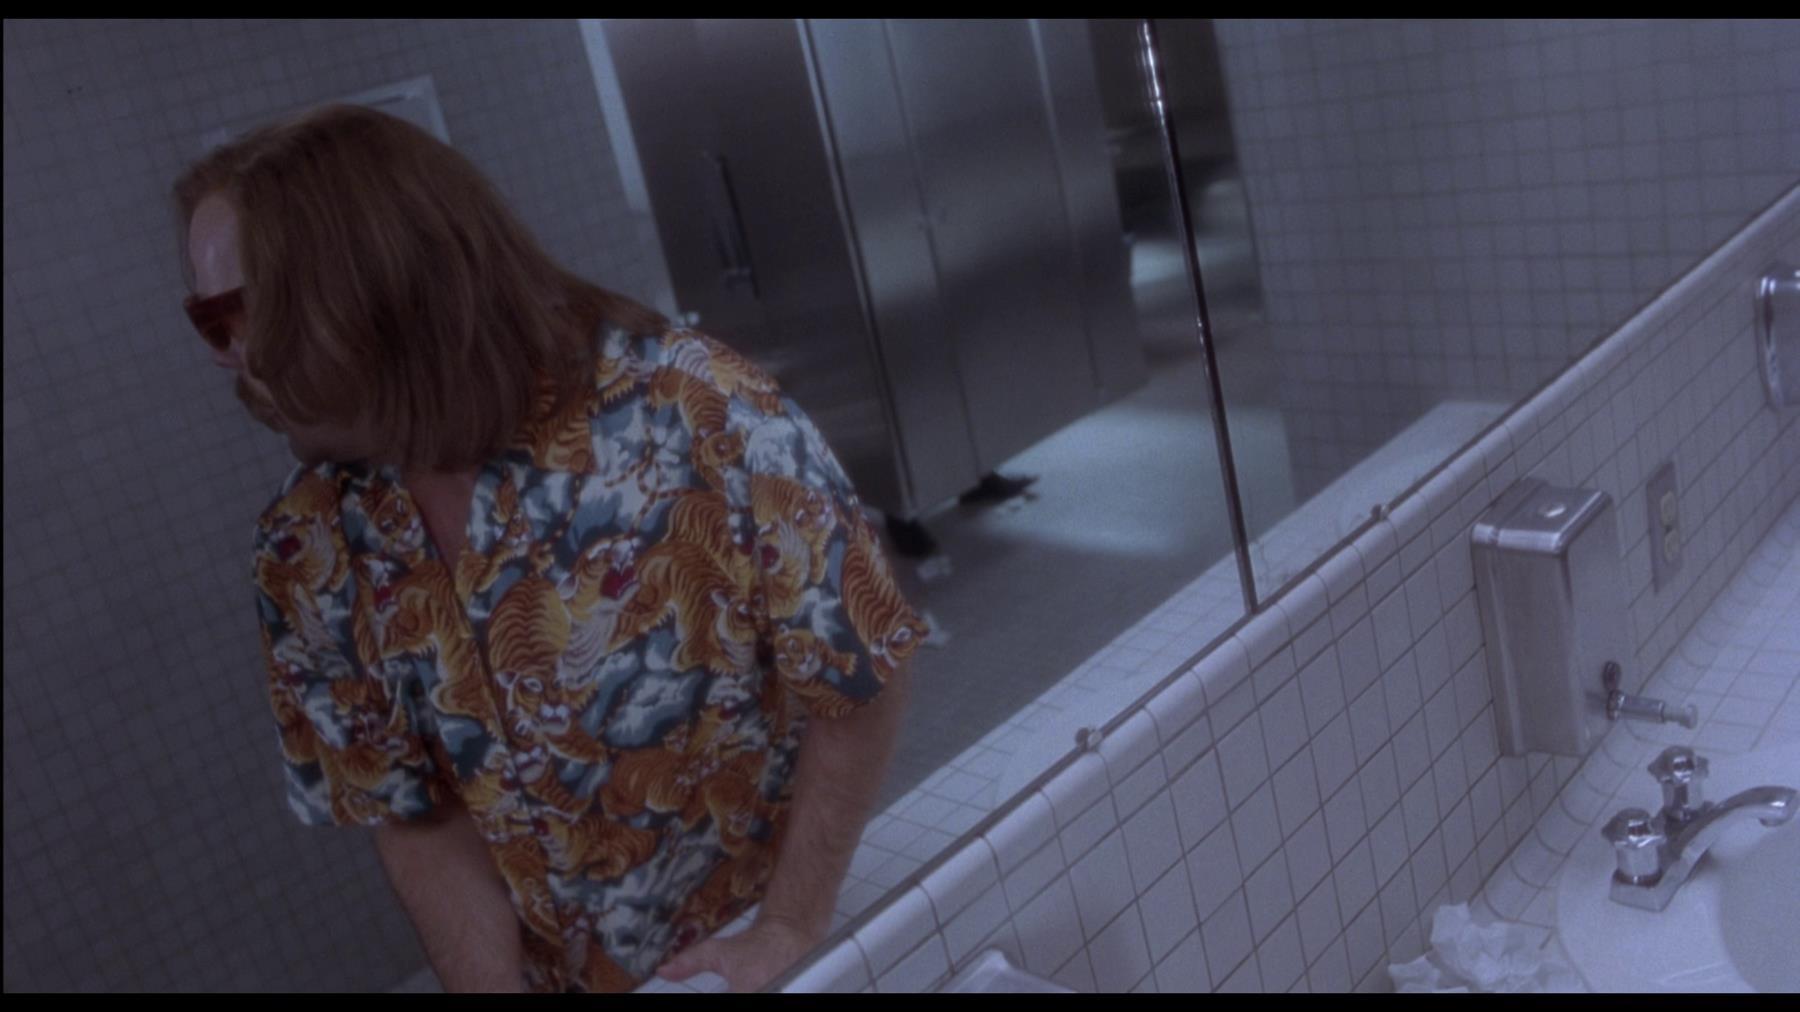 12 MONKEYS (1995) - James Cole's (Bruce Willis) Hawaiian Shirt - Image 7 of 8